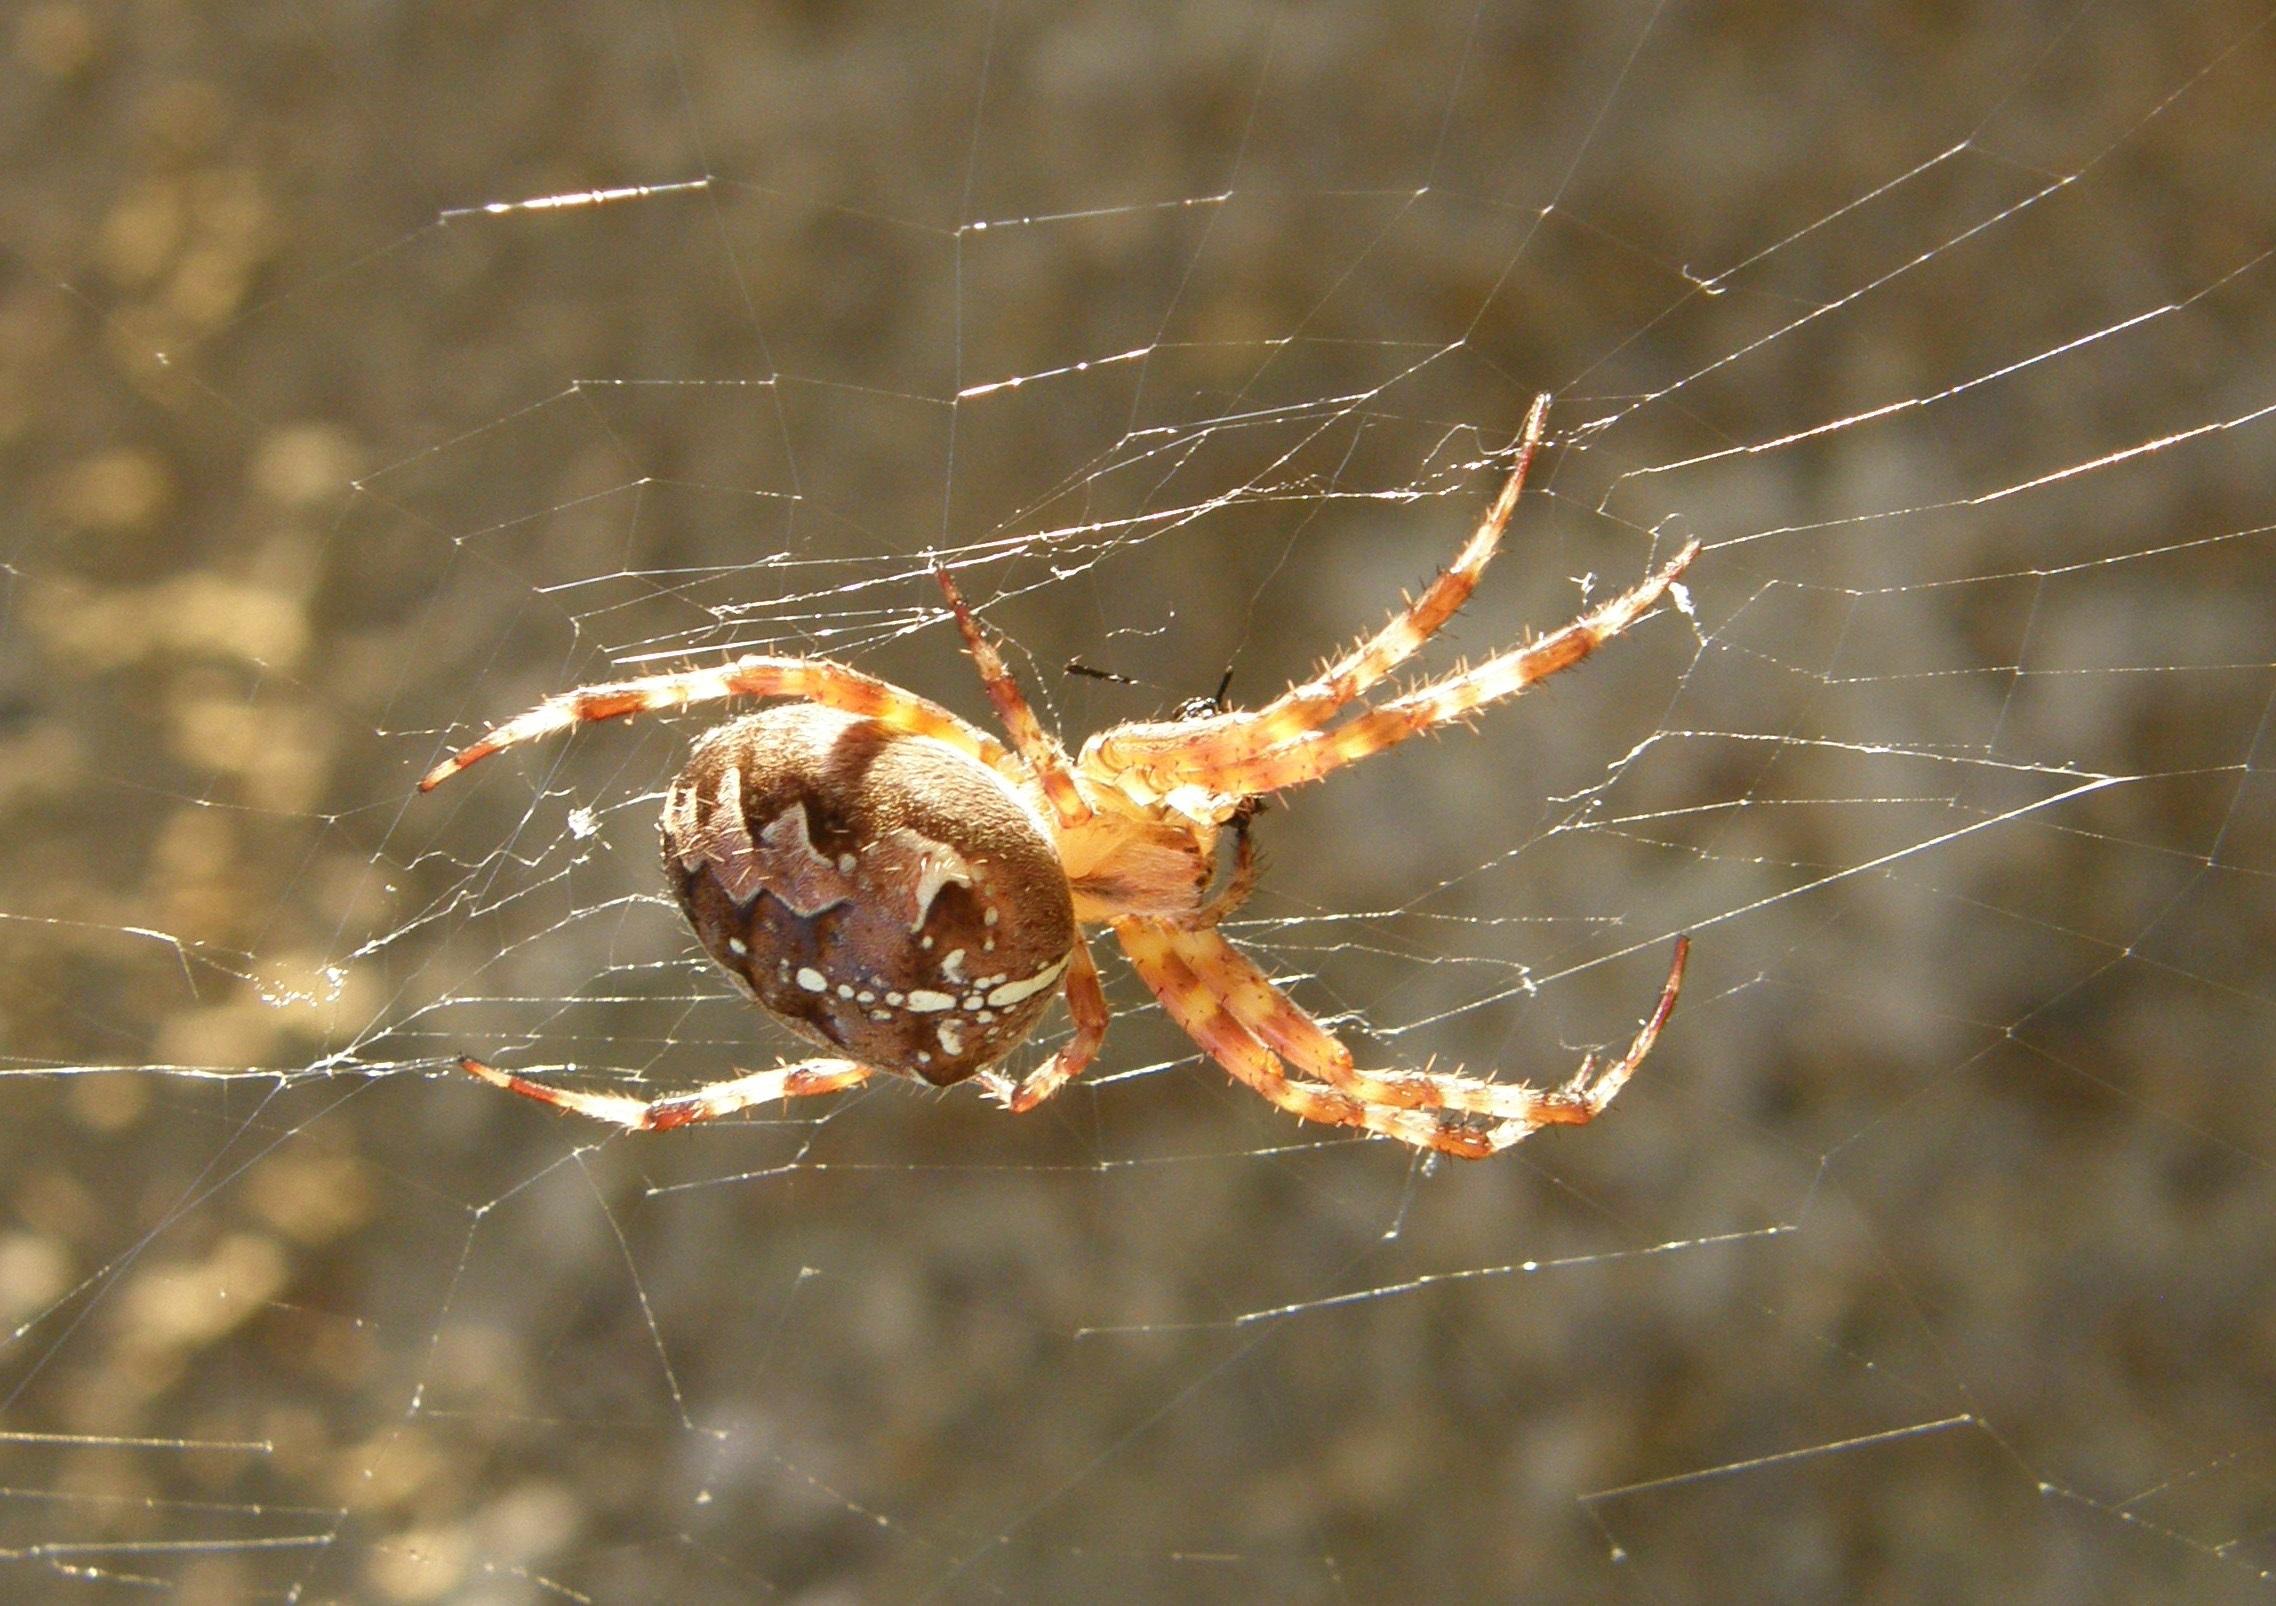 Free Images : nature, animal, fauna, material, invertebrate, spider ...